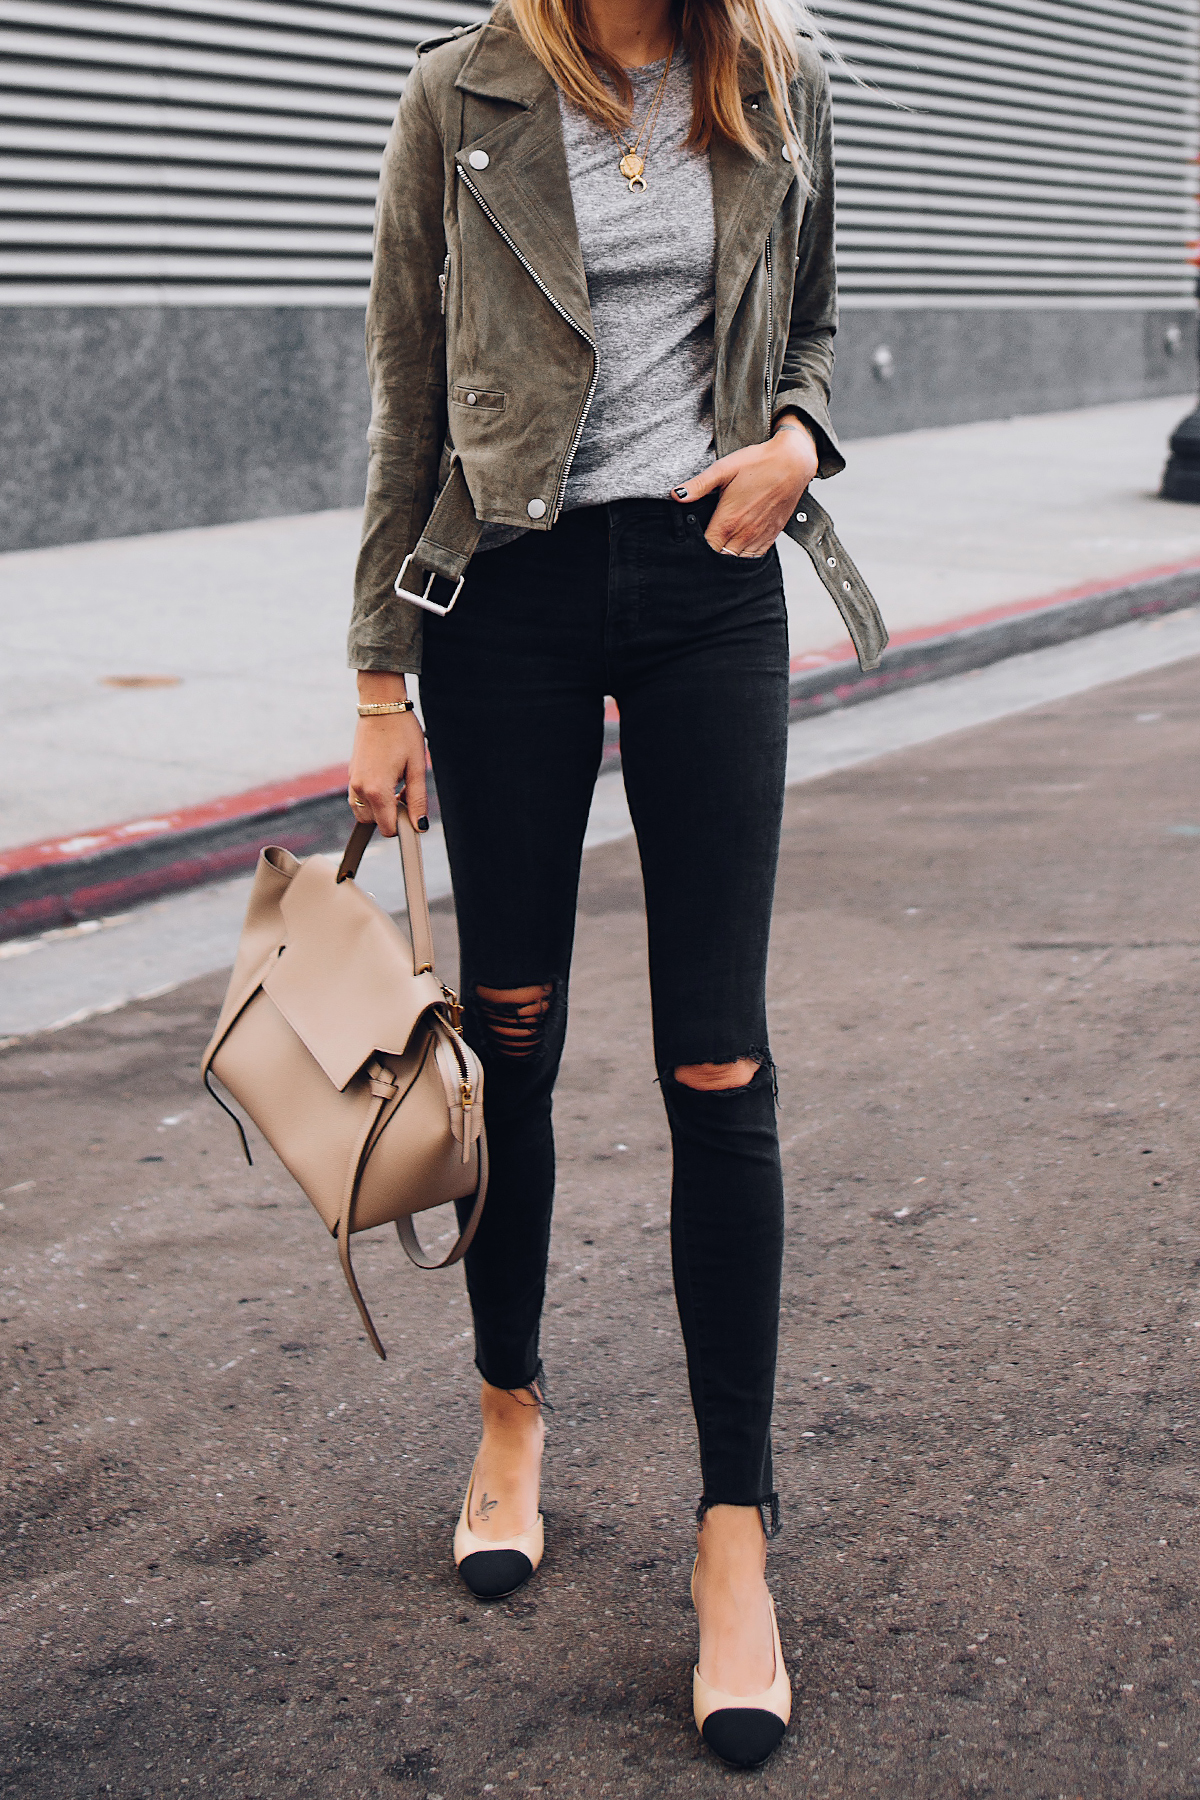 Woman Wearing Blanknyc Green Suede Moto Jacket Grey Tshirt Black Ripped Skinny Jeans Chanel Slingbacks Celine Mini Belt Bag Fashion Jackson San Diego Fashion Blogger Street Style